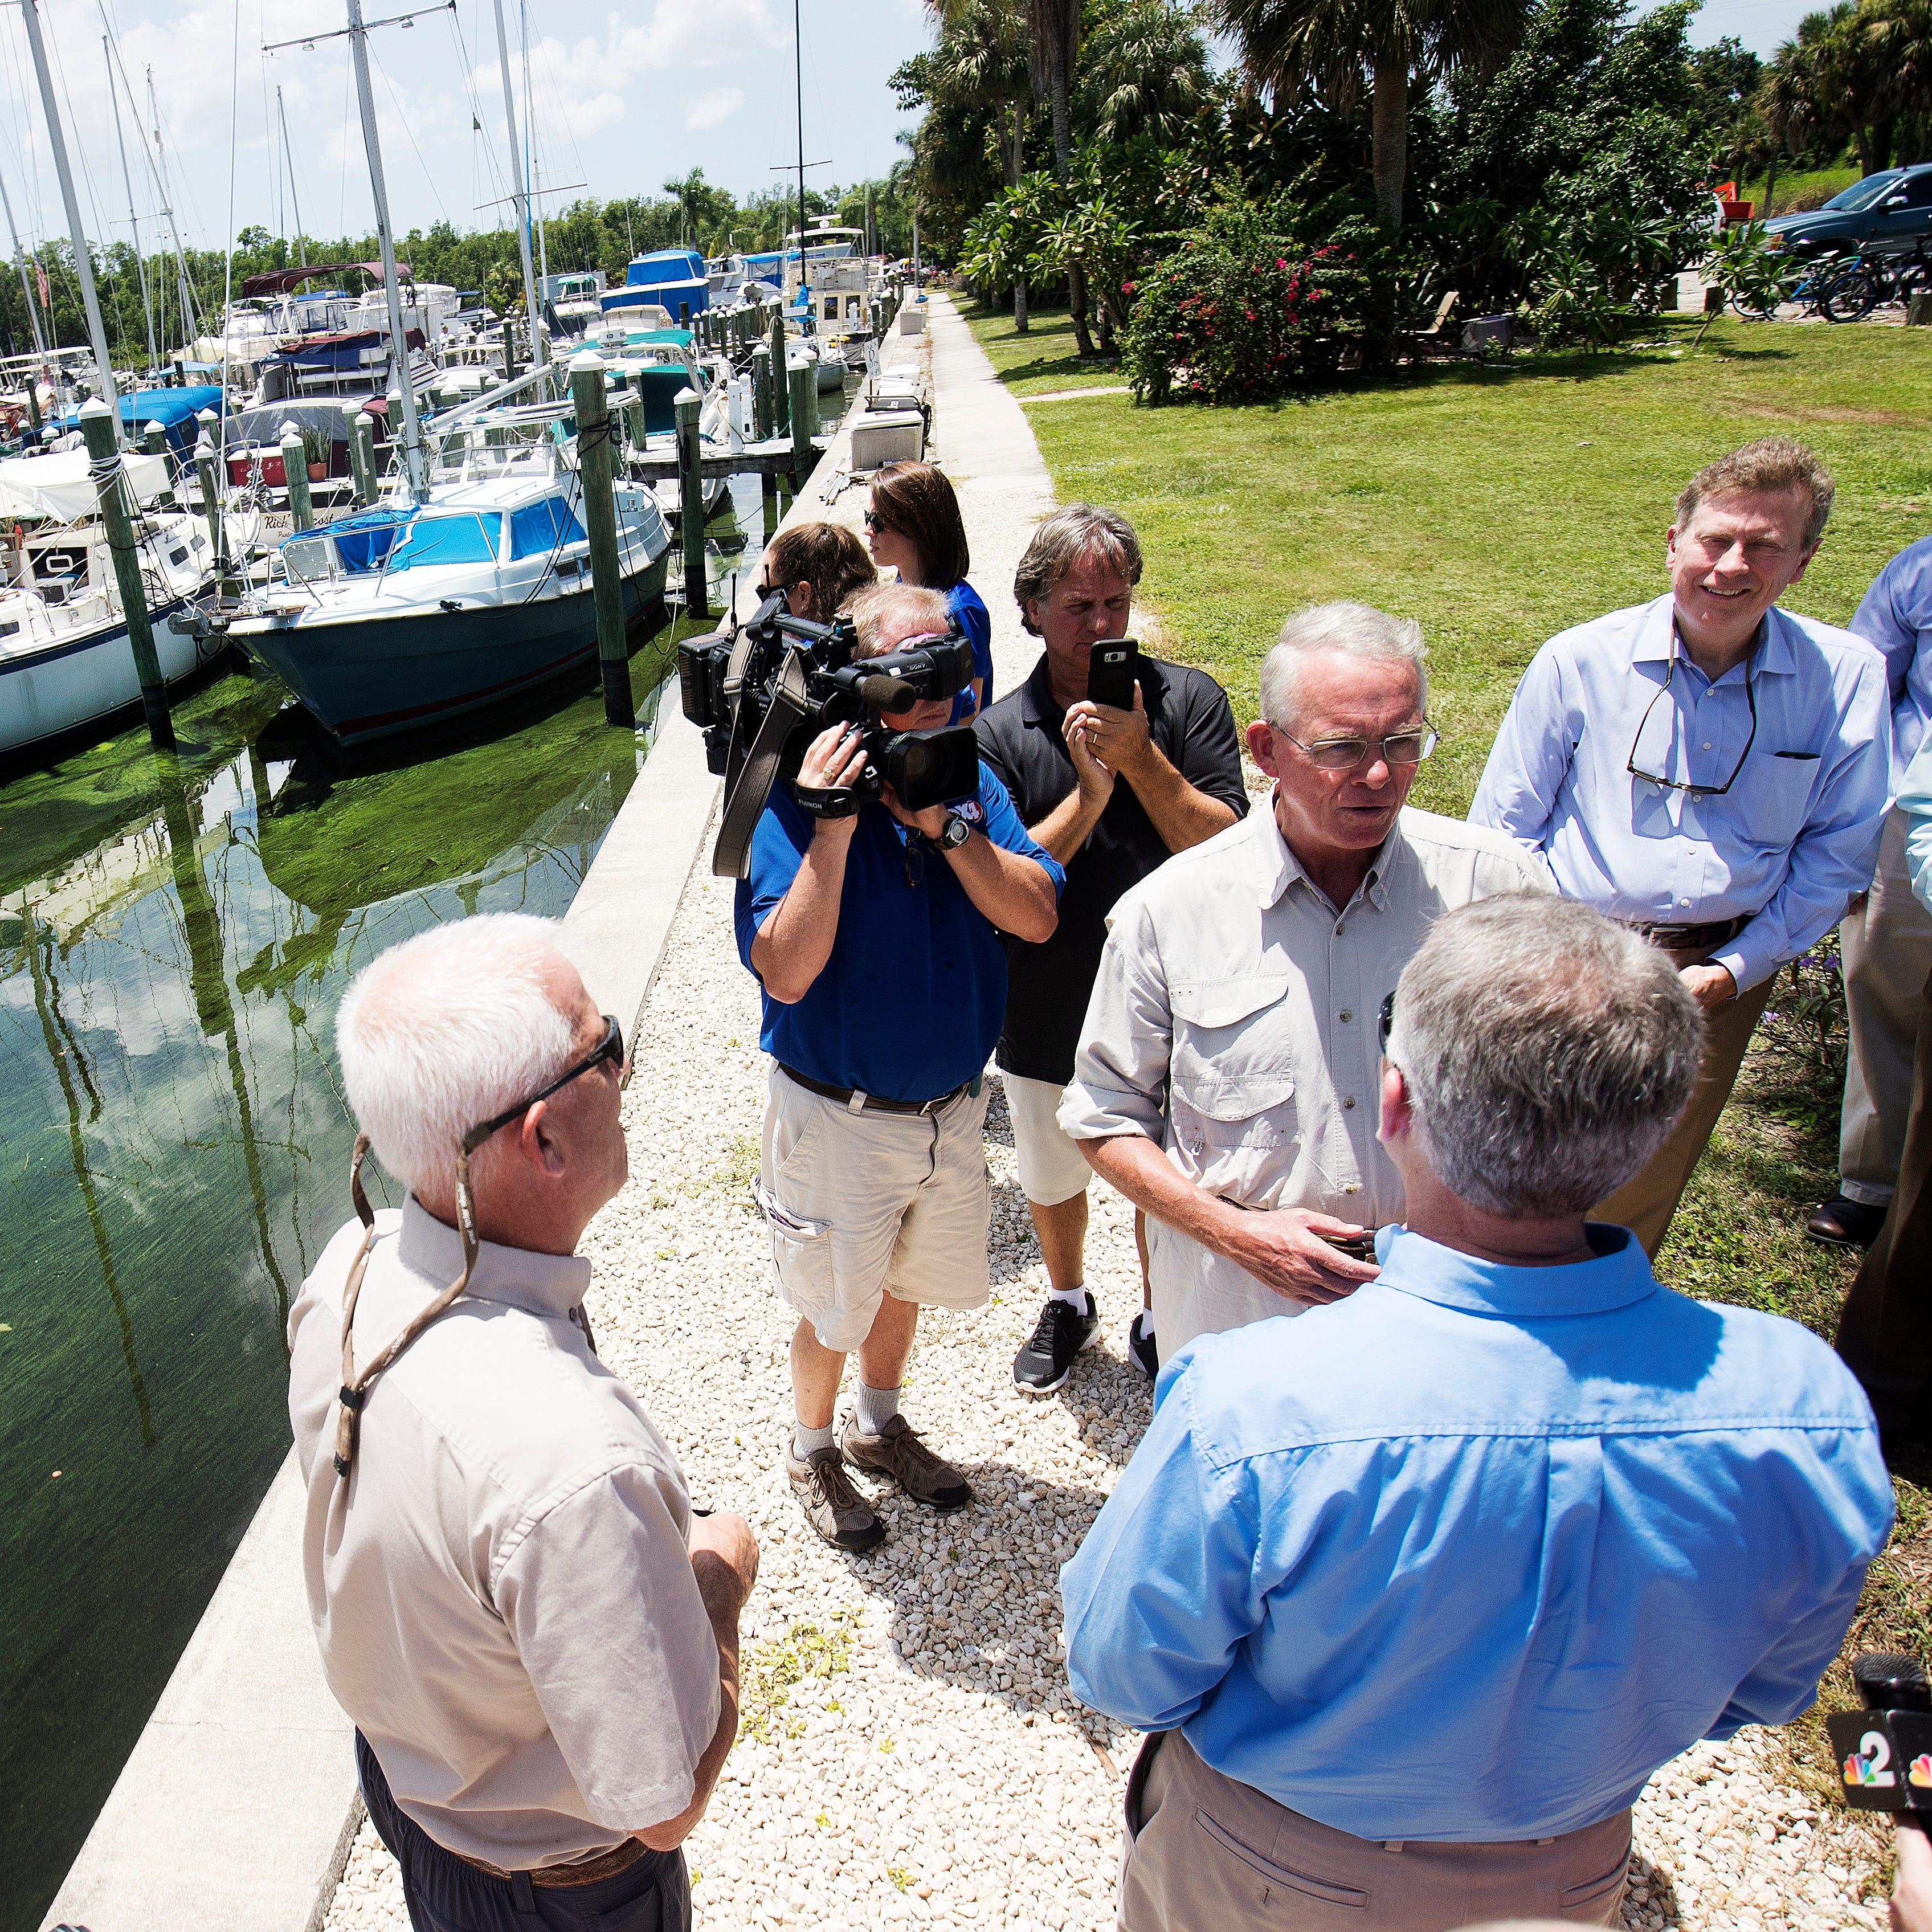 Septic leaks, fertilizer run-off targets of Lee water clean-up efforts